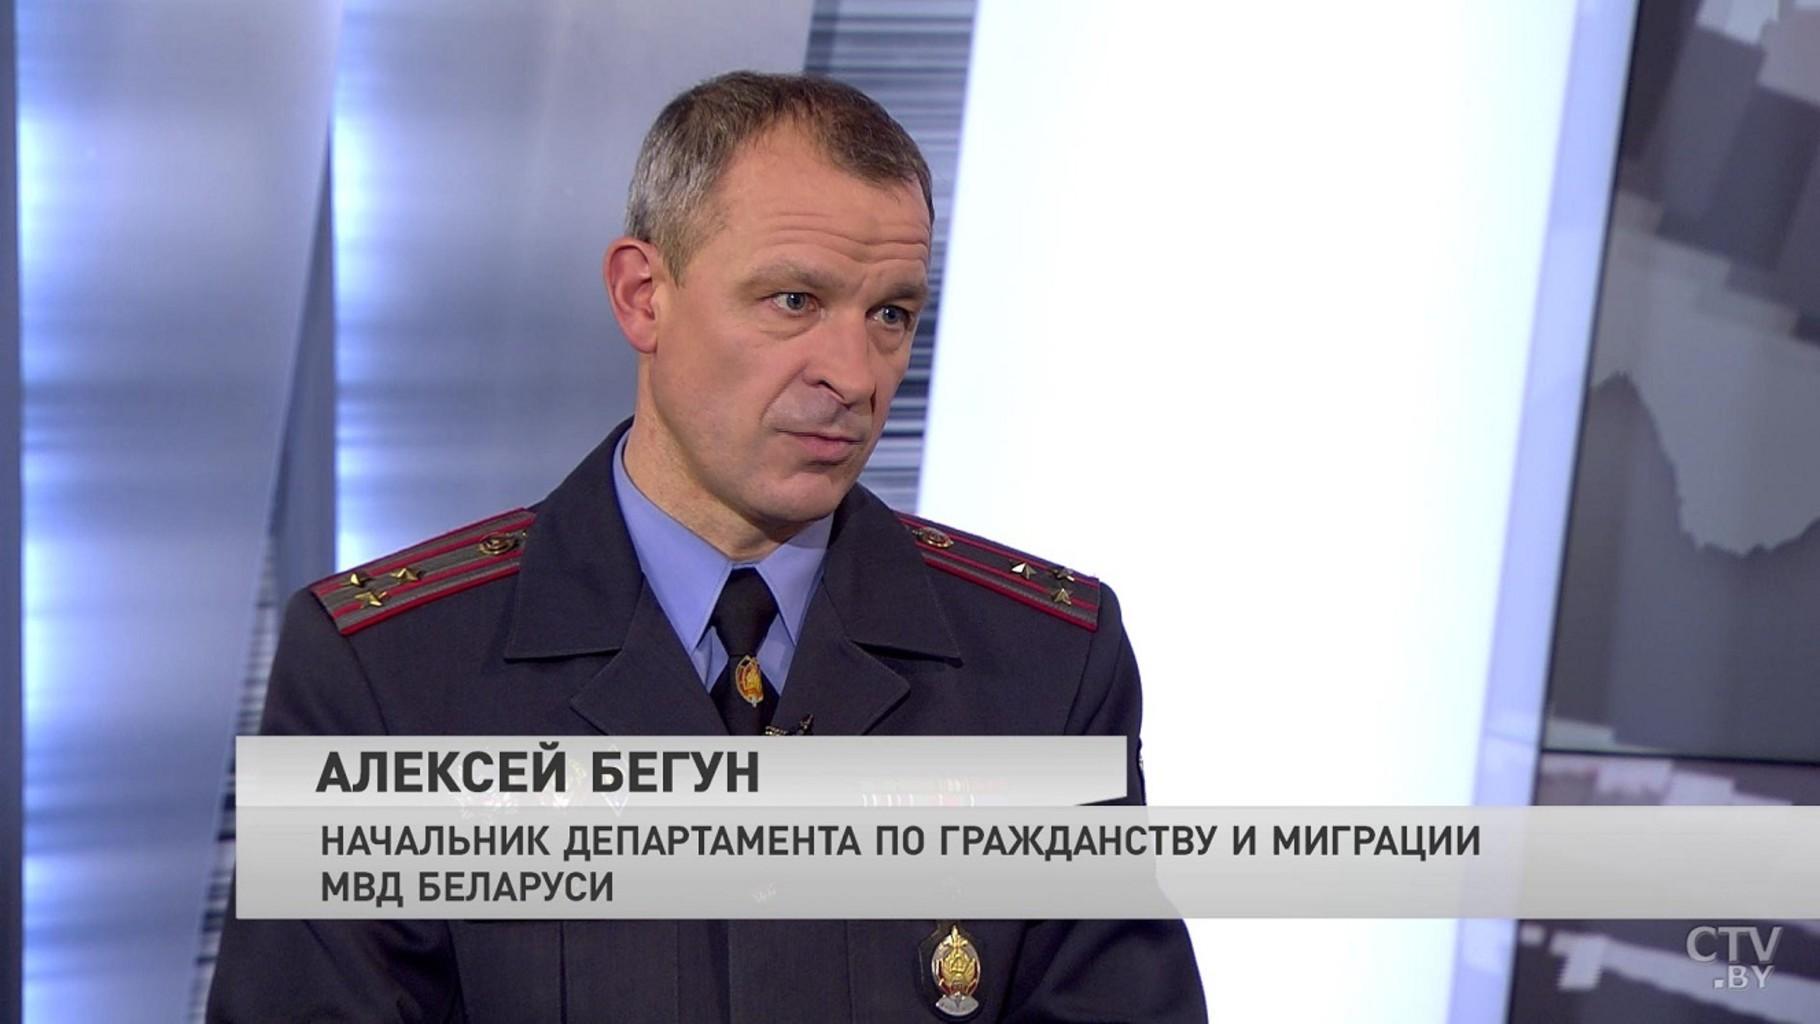 Aleksey begun intervyu 8